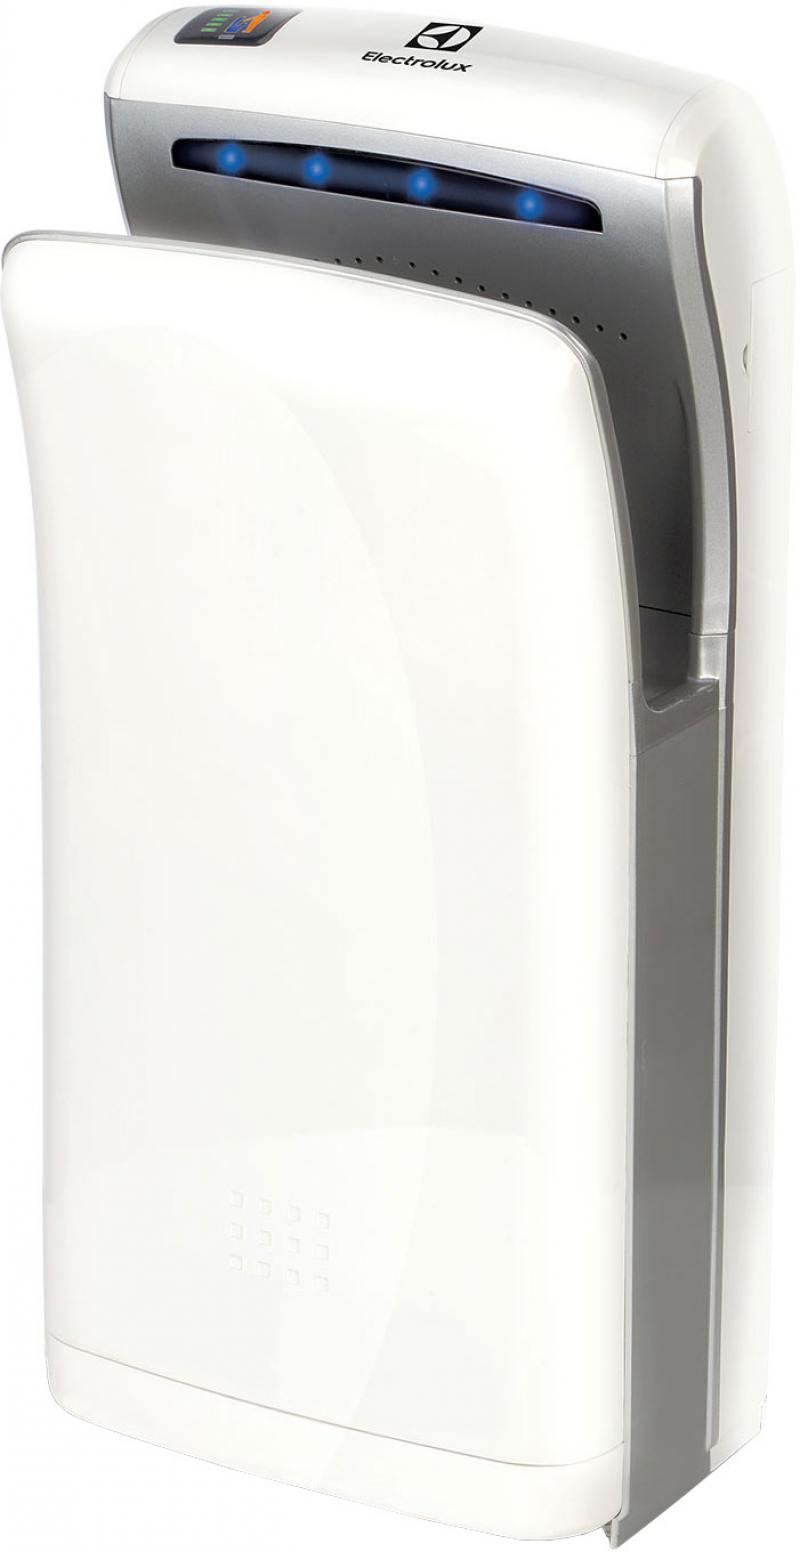 Сушилка для рук Electrolux EHDA/HPF-1200W 1200 белый  цены